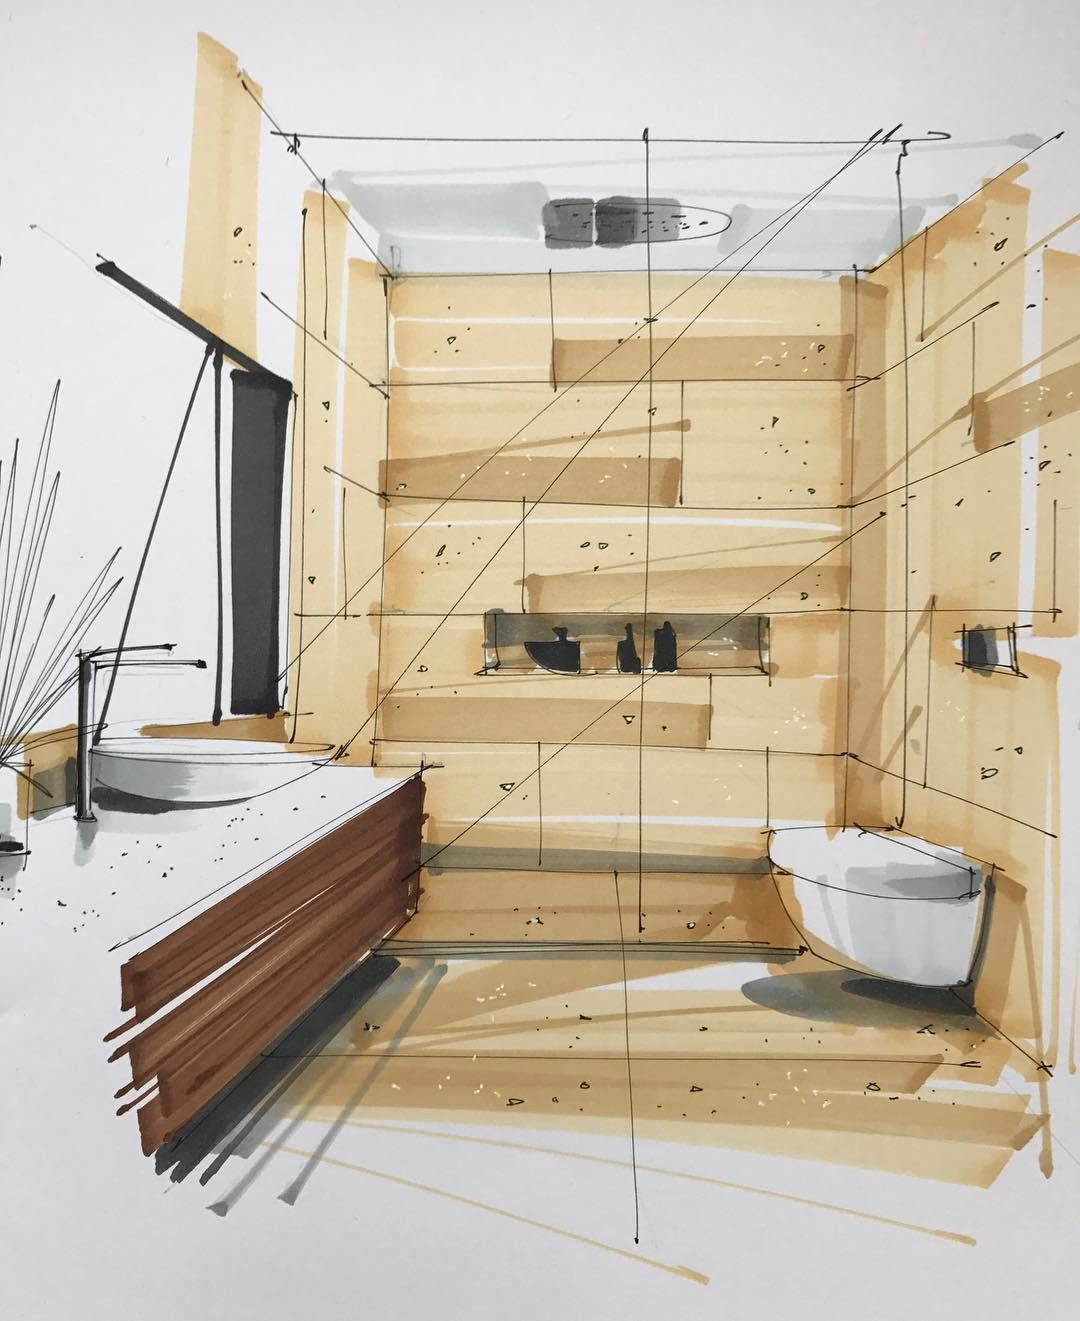 "Sergei Tihomirov on Instagram: ""Interior sketching #artwork #drawing #interiorsketcher #interiorsketching #sketching #sketchbook #markersketch #interiordesign #architect…"" #arquitectonico"